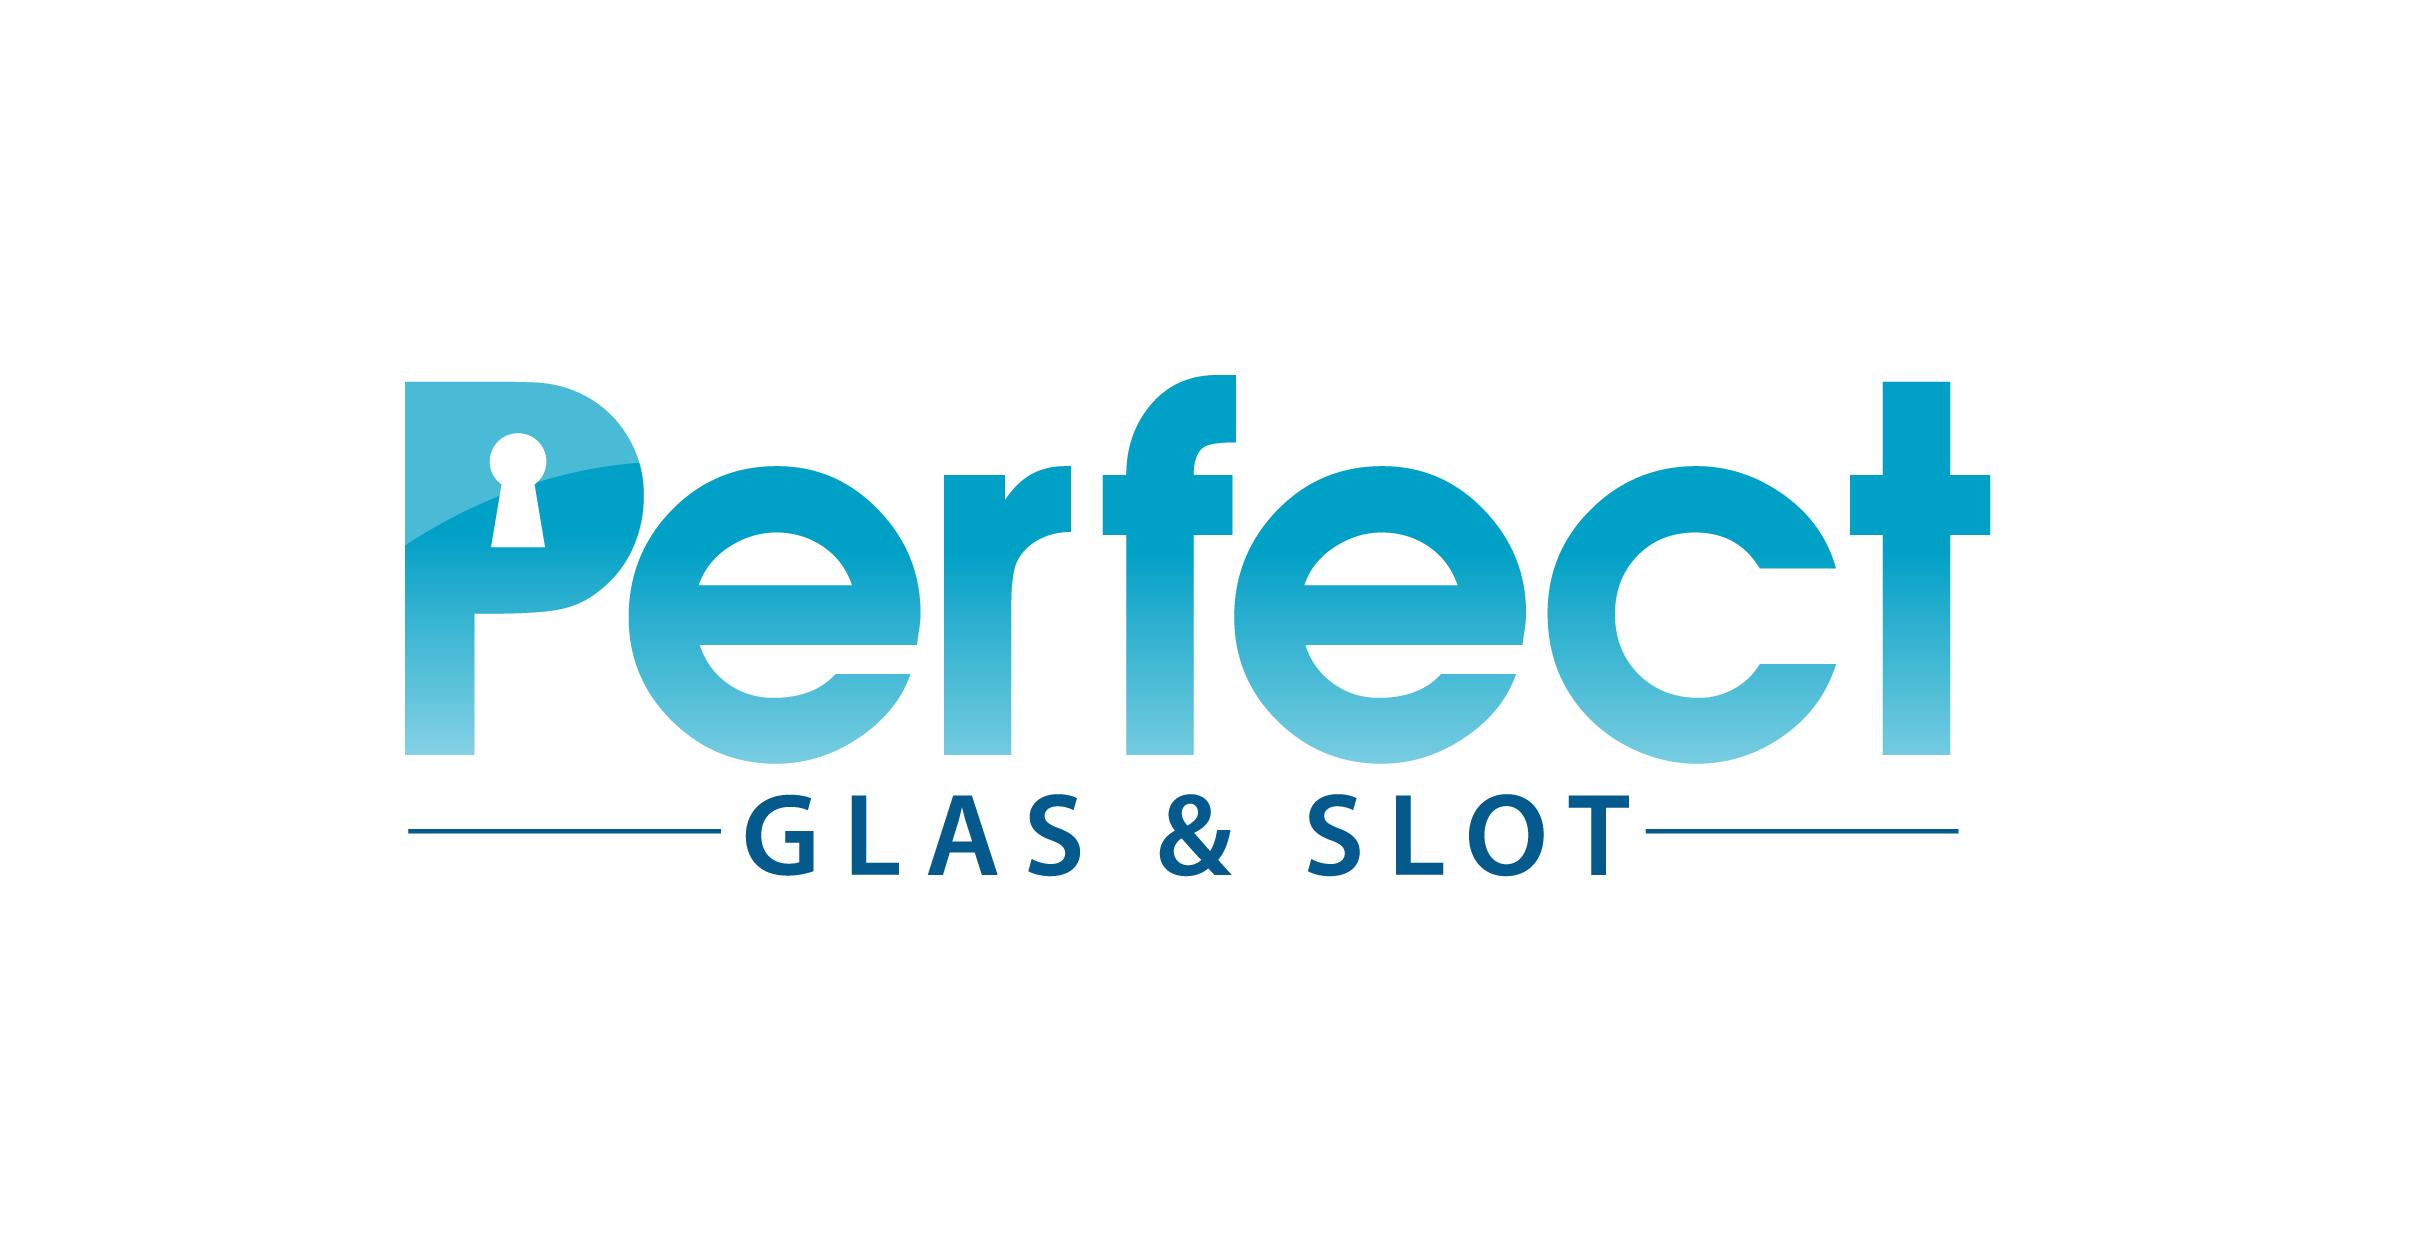 Glas & Slot